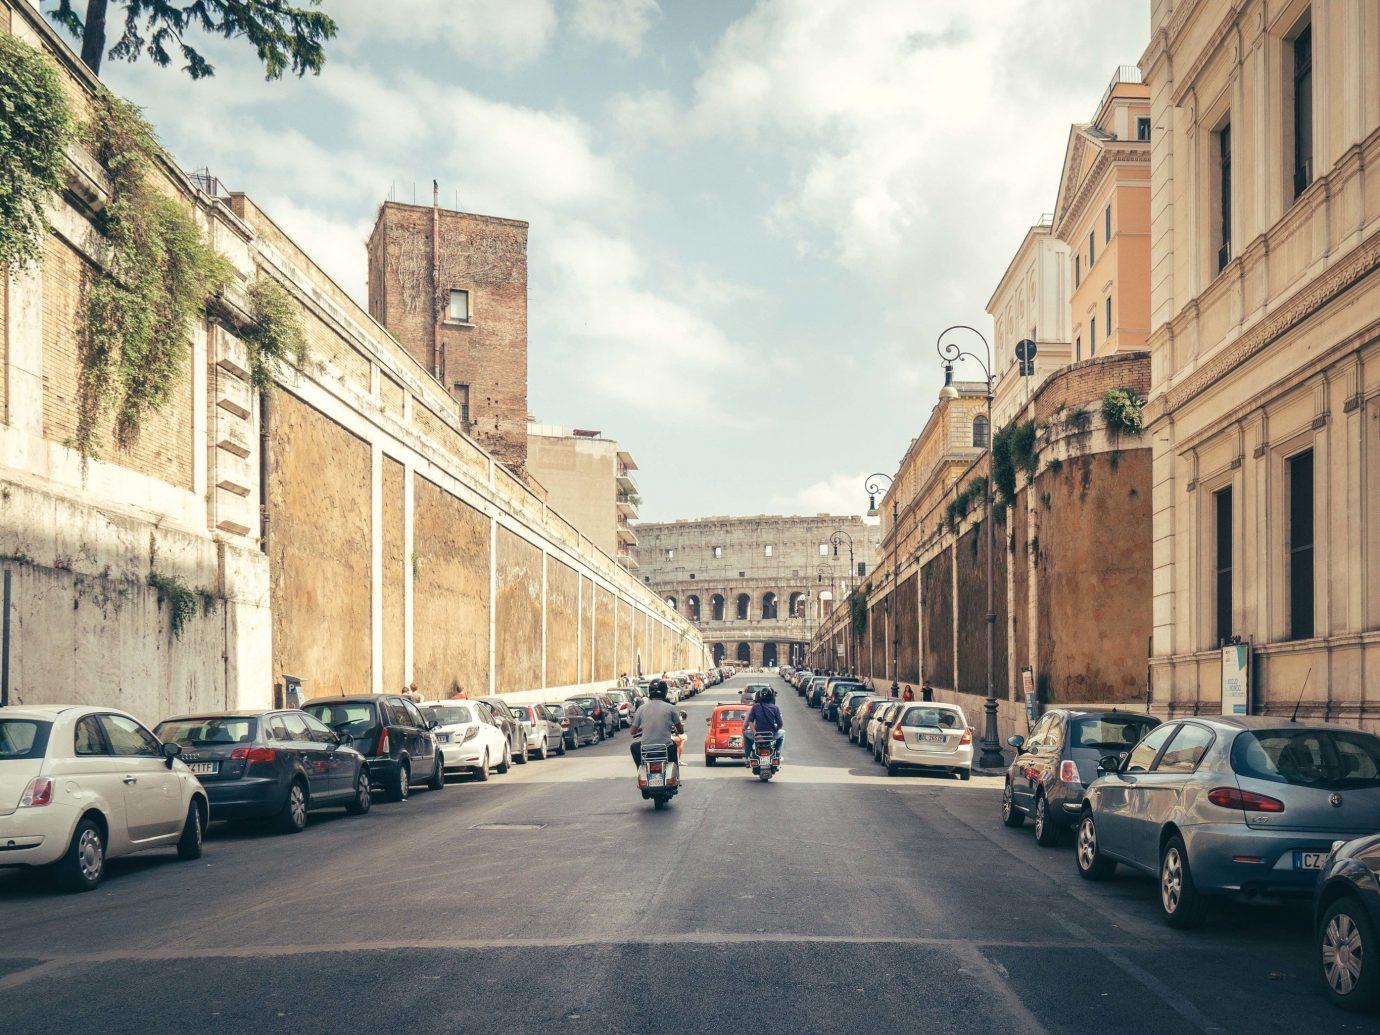 Vespa tours of Rome